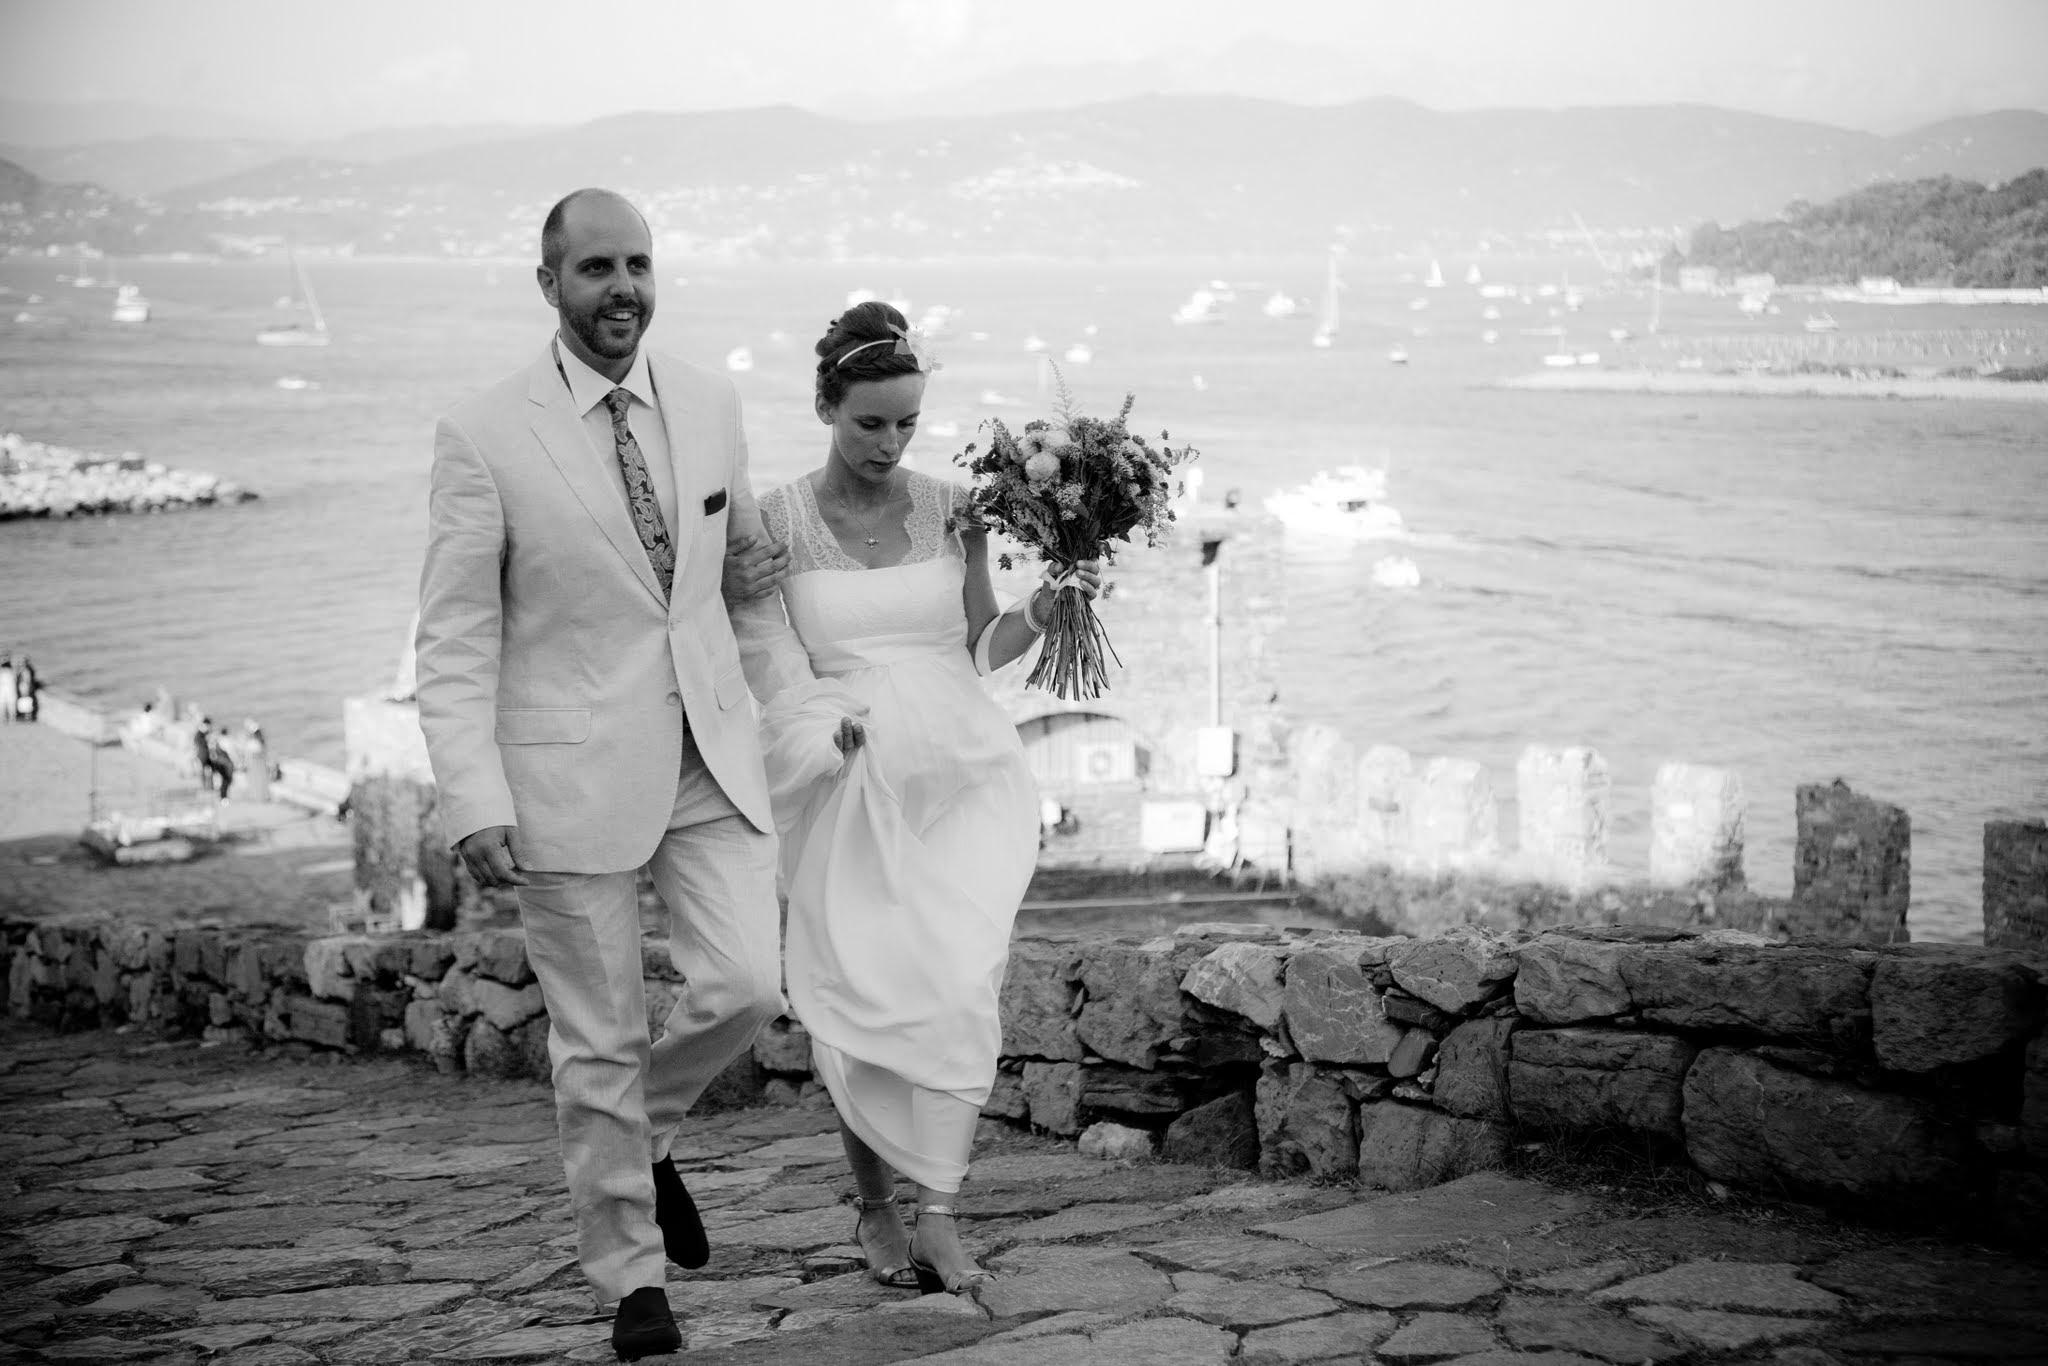 Le mariage franco-italien de Madame N. en bord de mer à Portovenere